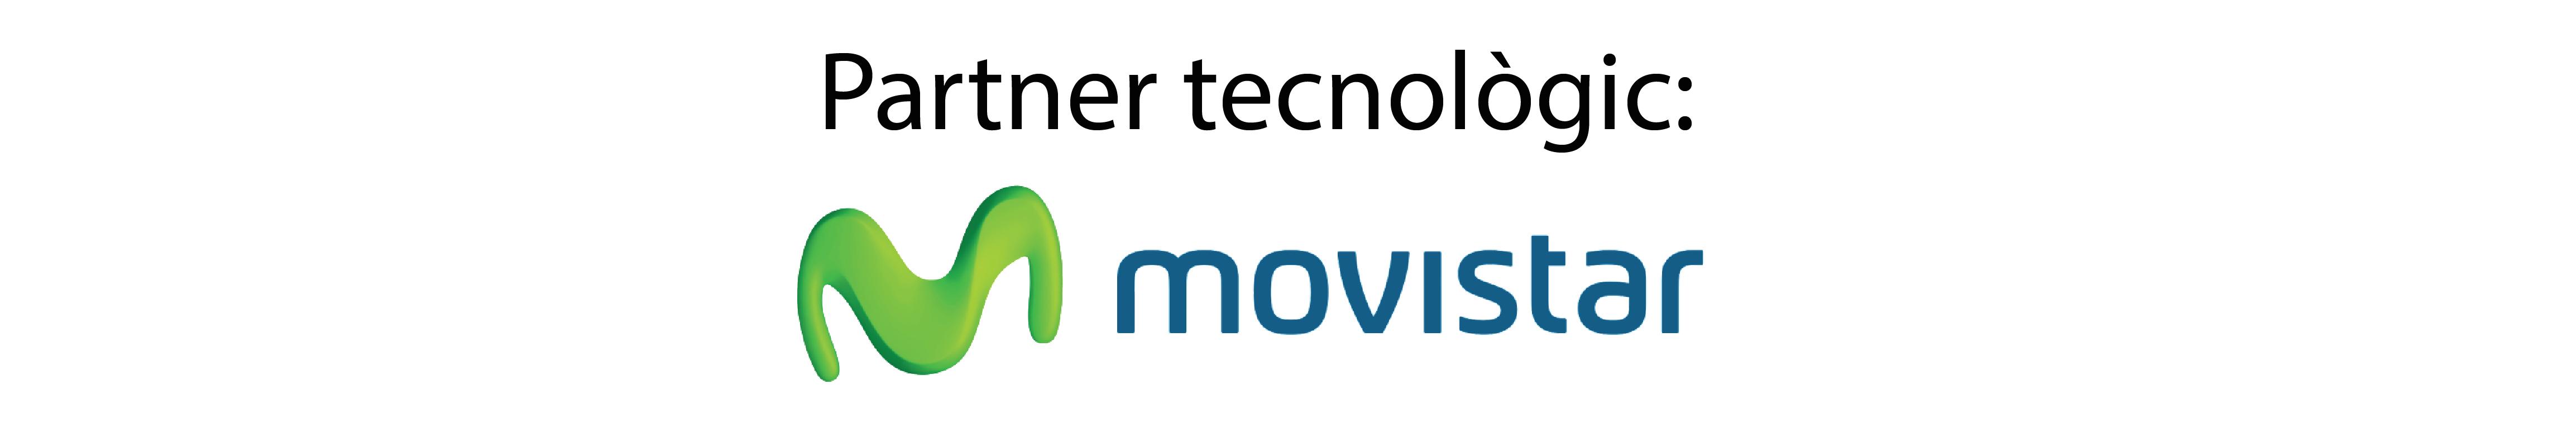 Movistar - Socio tecnológico